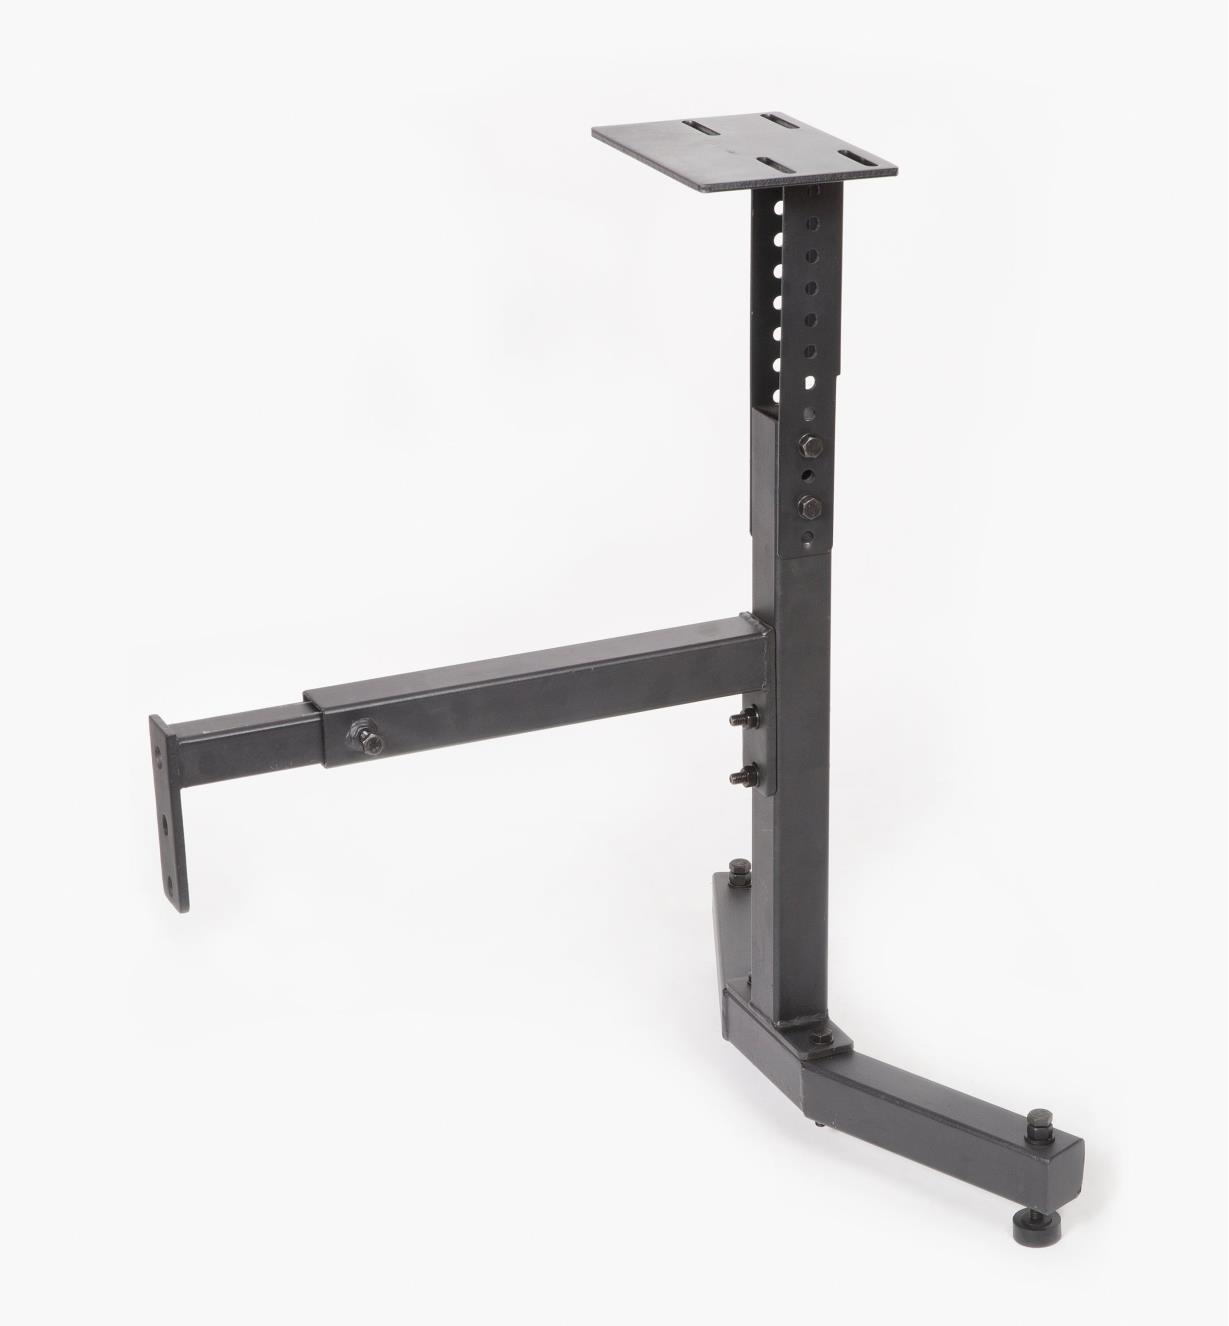 03J7331 - Rikon Midi Lathe Stand Extension